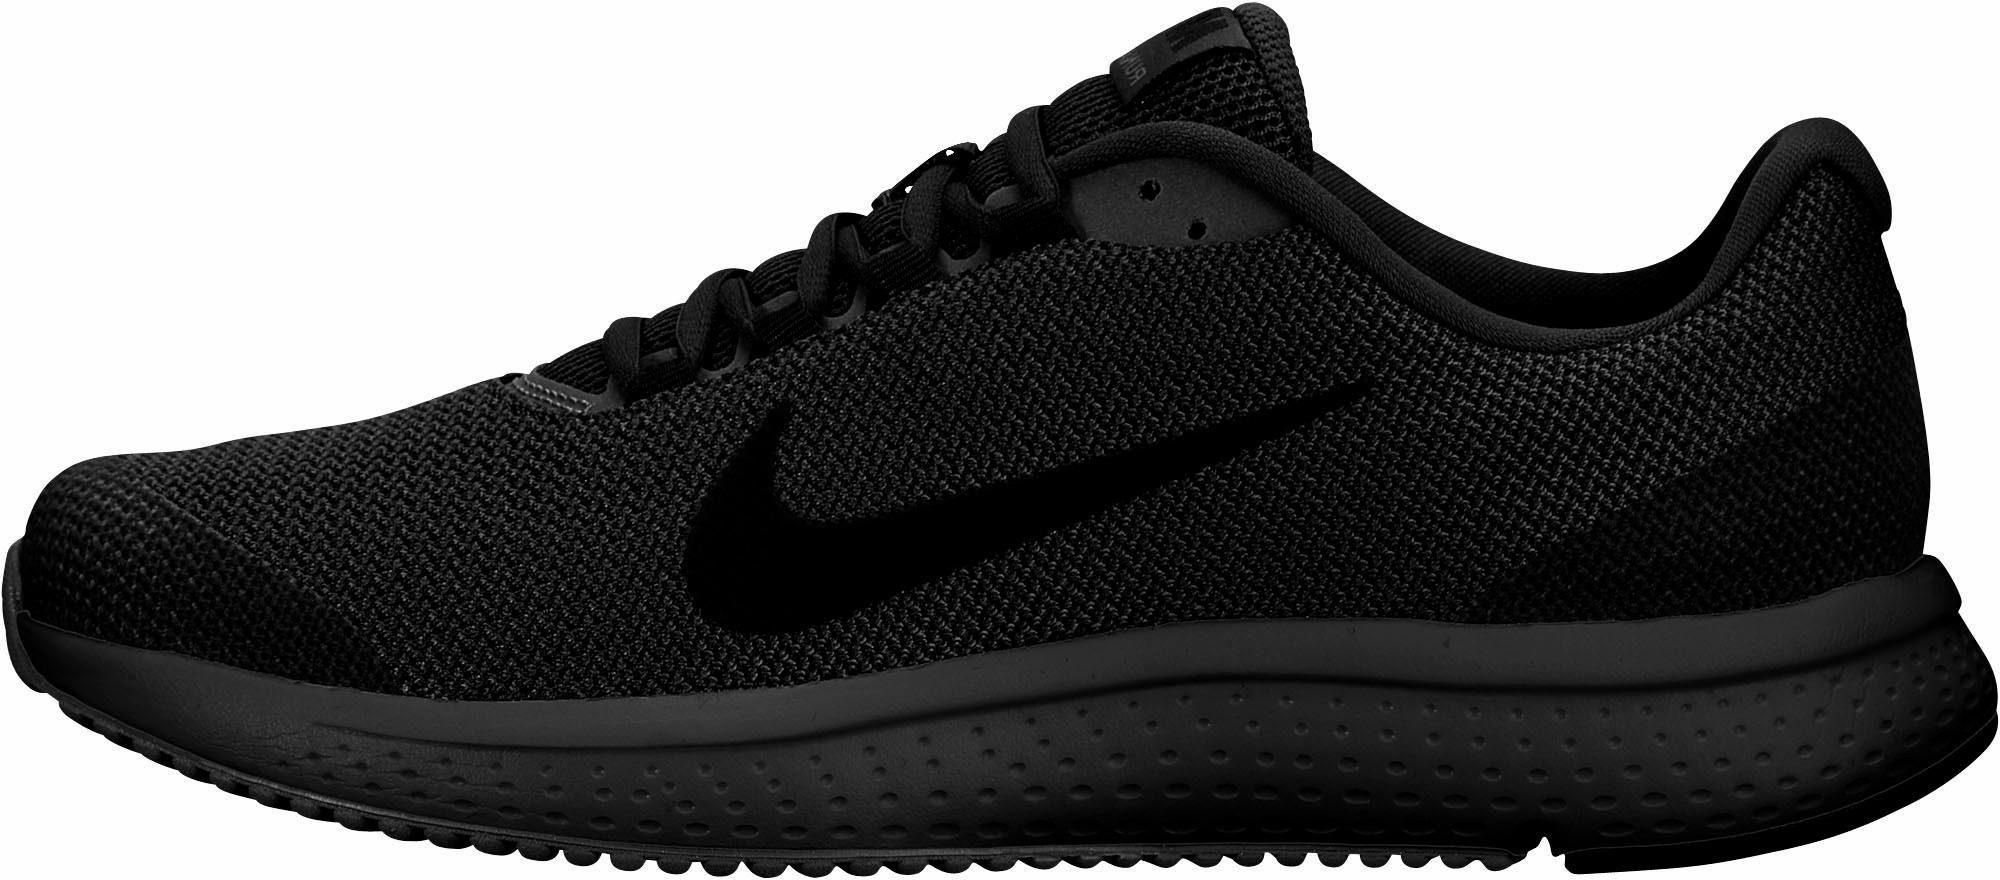 Nike »Runallday« Laufschuh, Atmungsaktives Obermaterial aus Mesh online  kaufen | OTTO